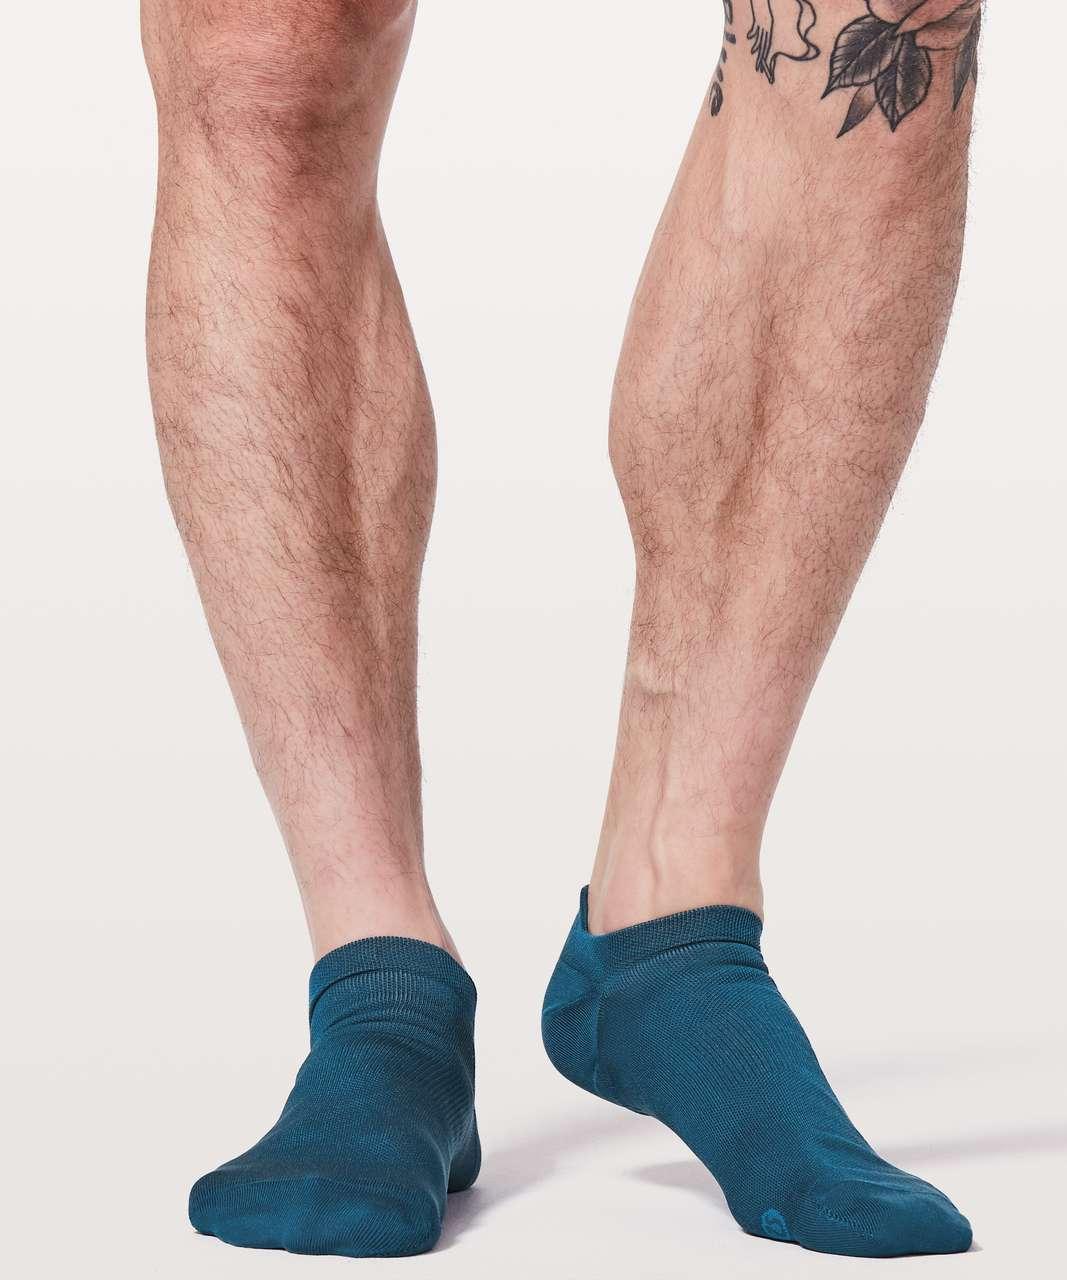 Lululemon Surge Sock *Silver - Poseidon / Cyprus